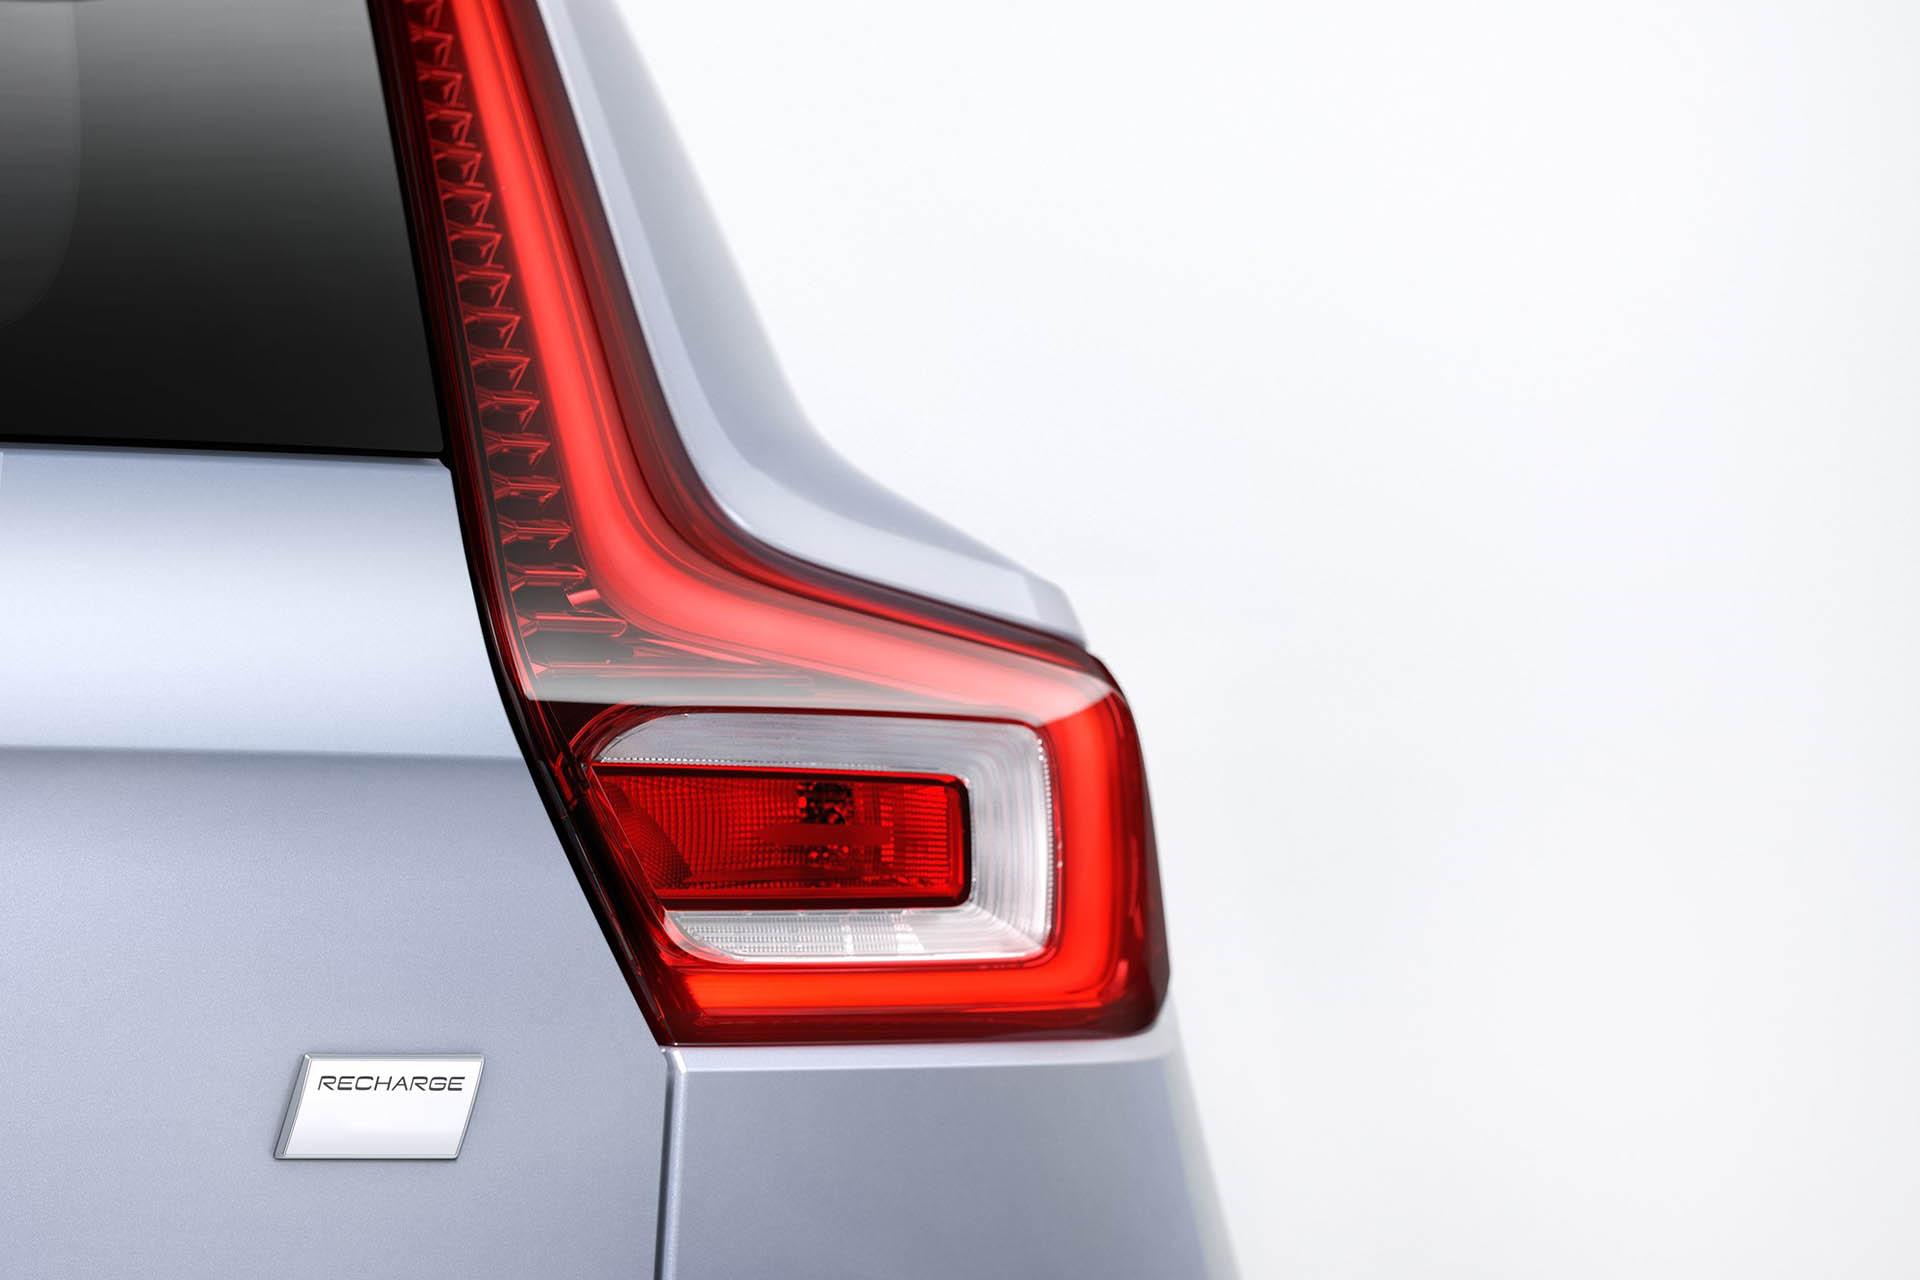 Volvo Recharge abroncsok